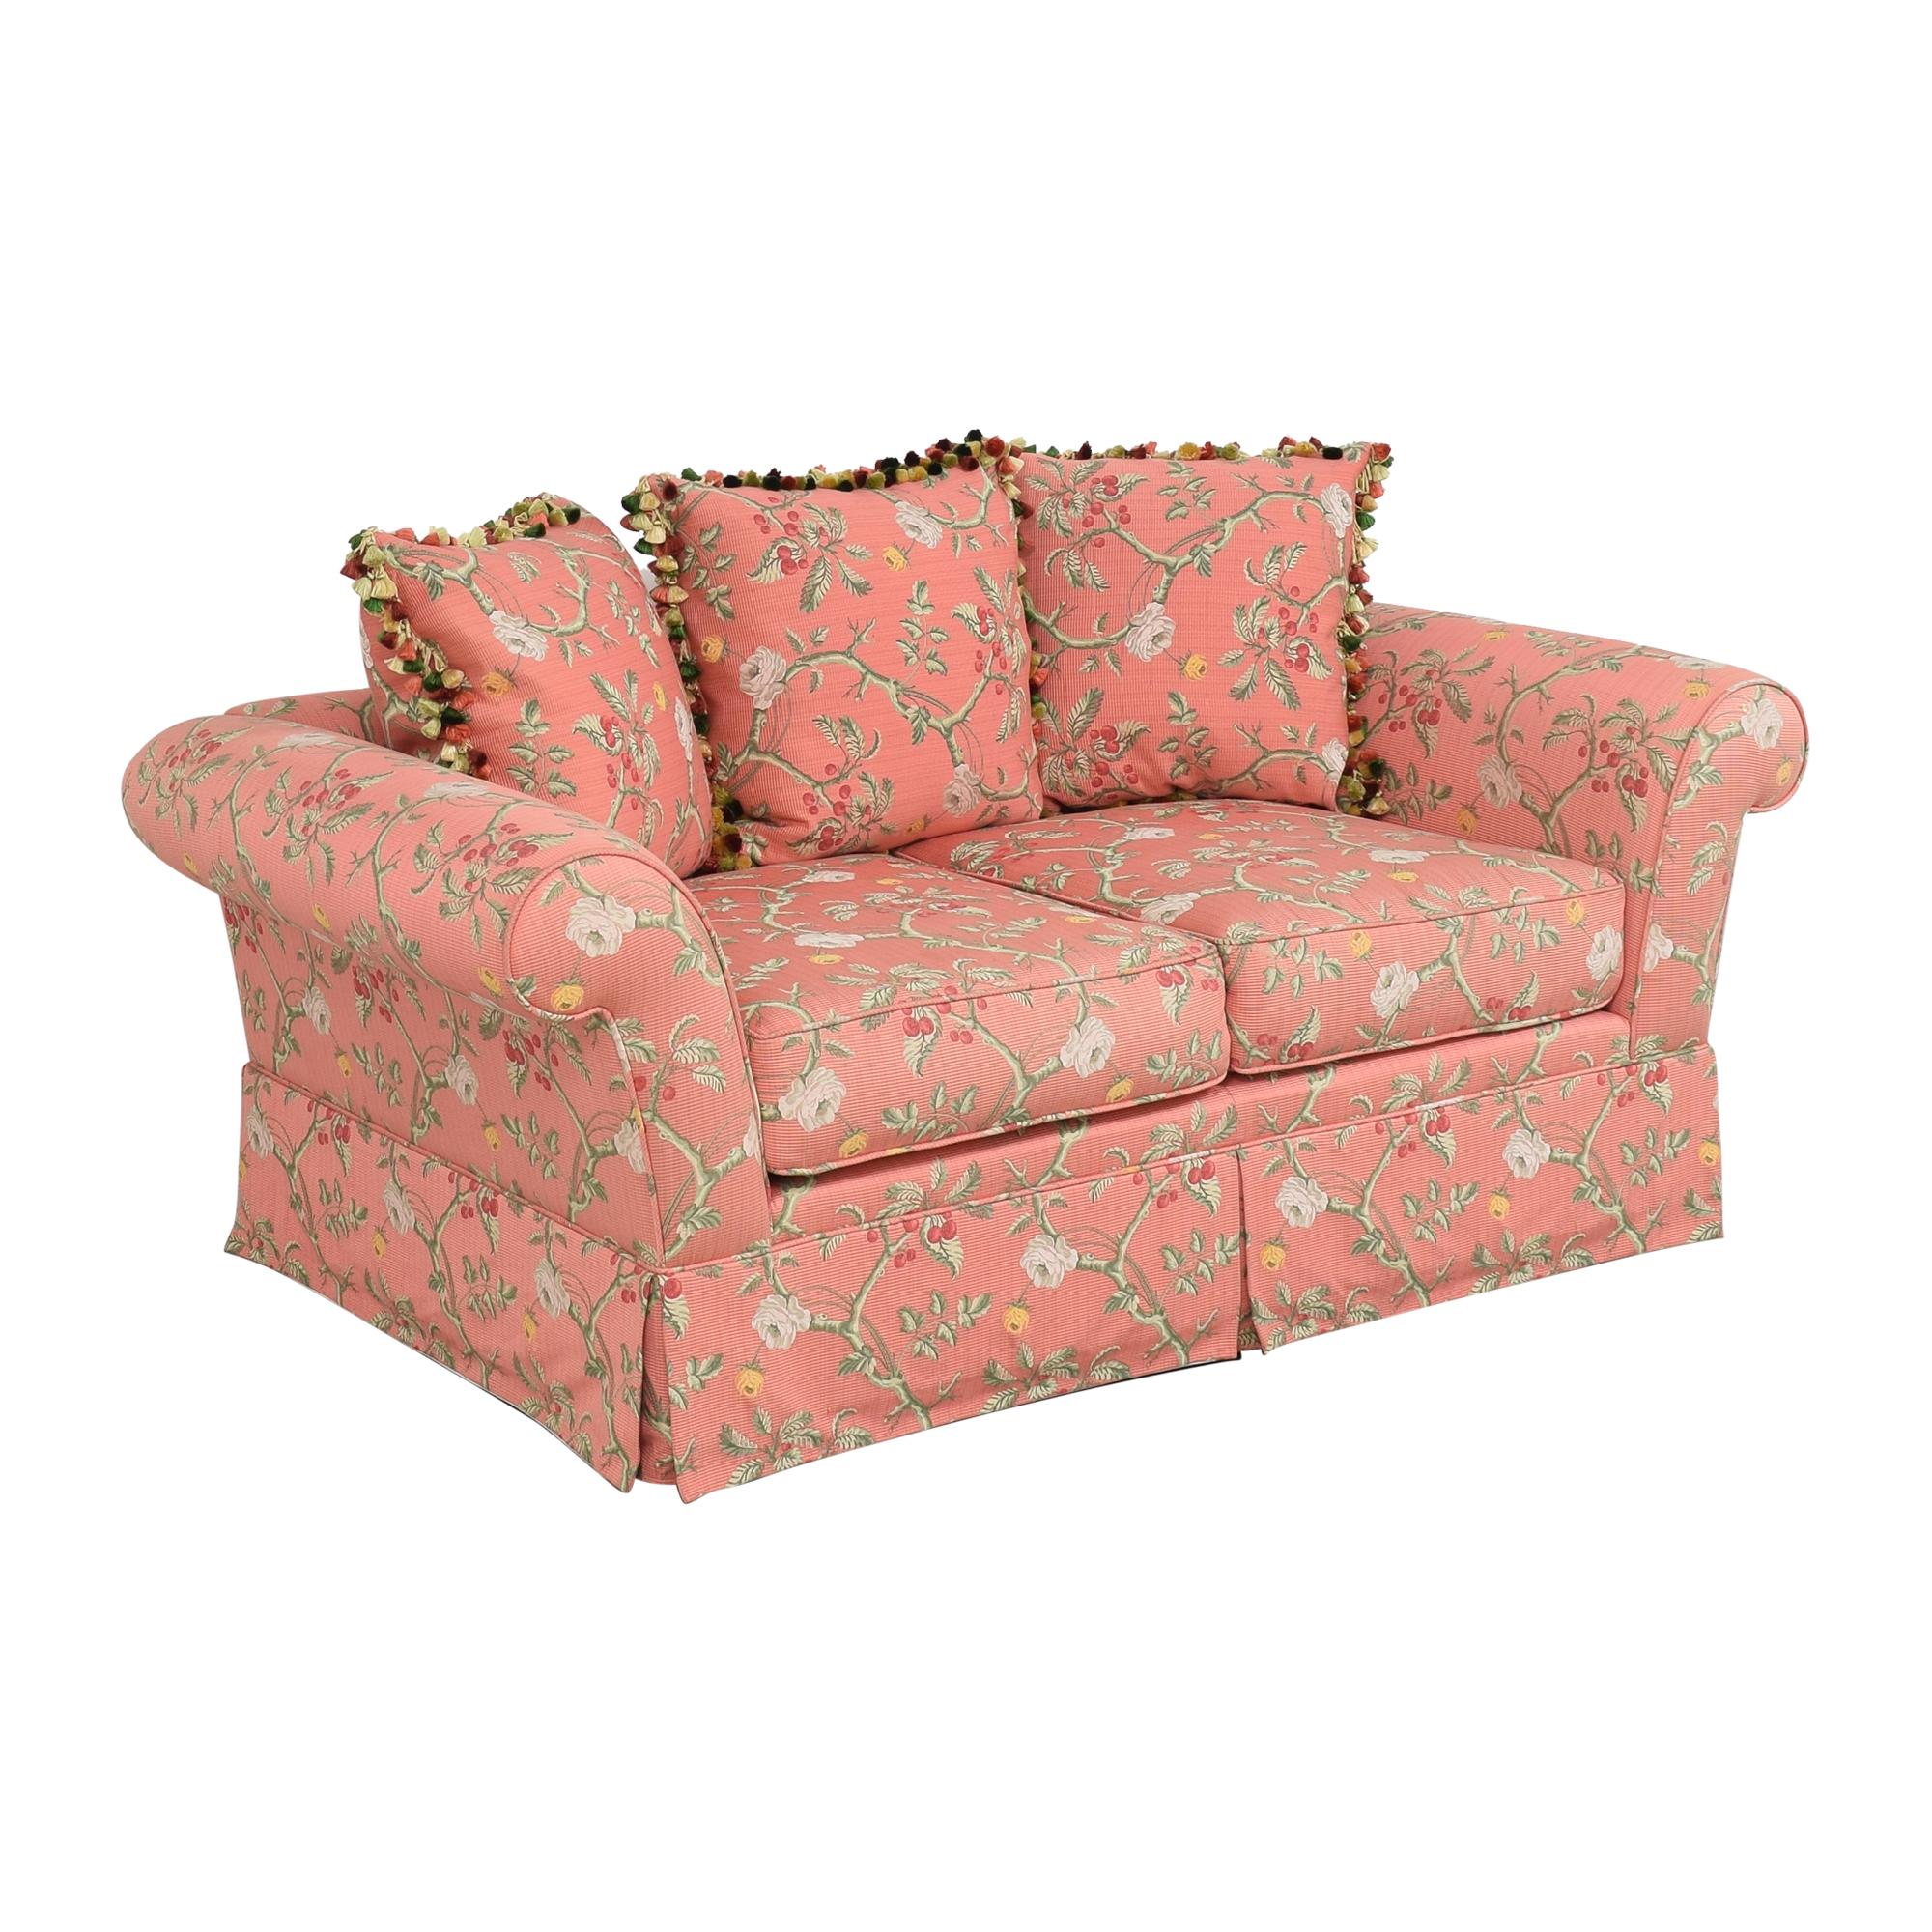 Custom Skirted Two Cushion Sofa dimensions